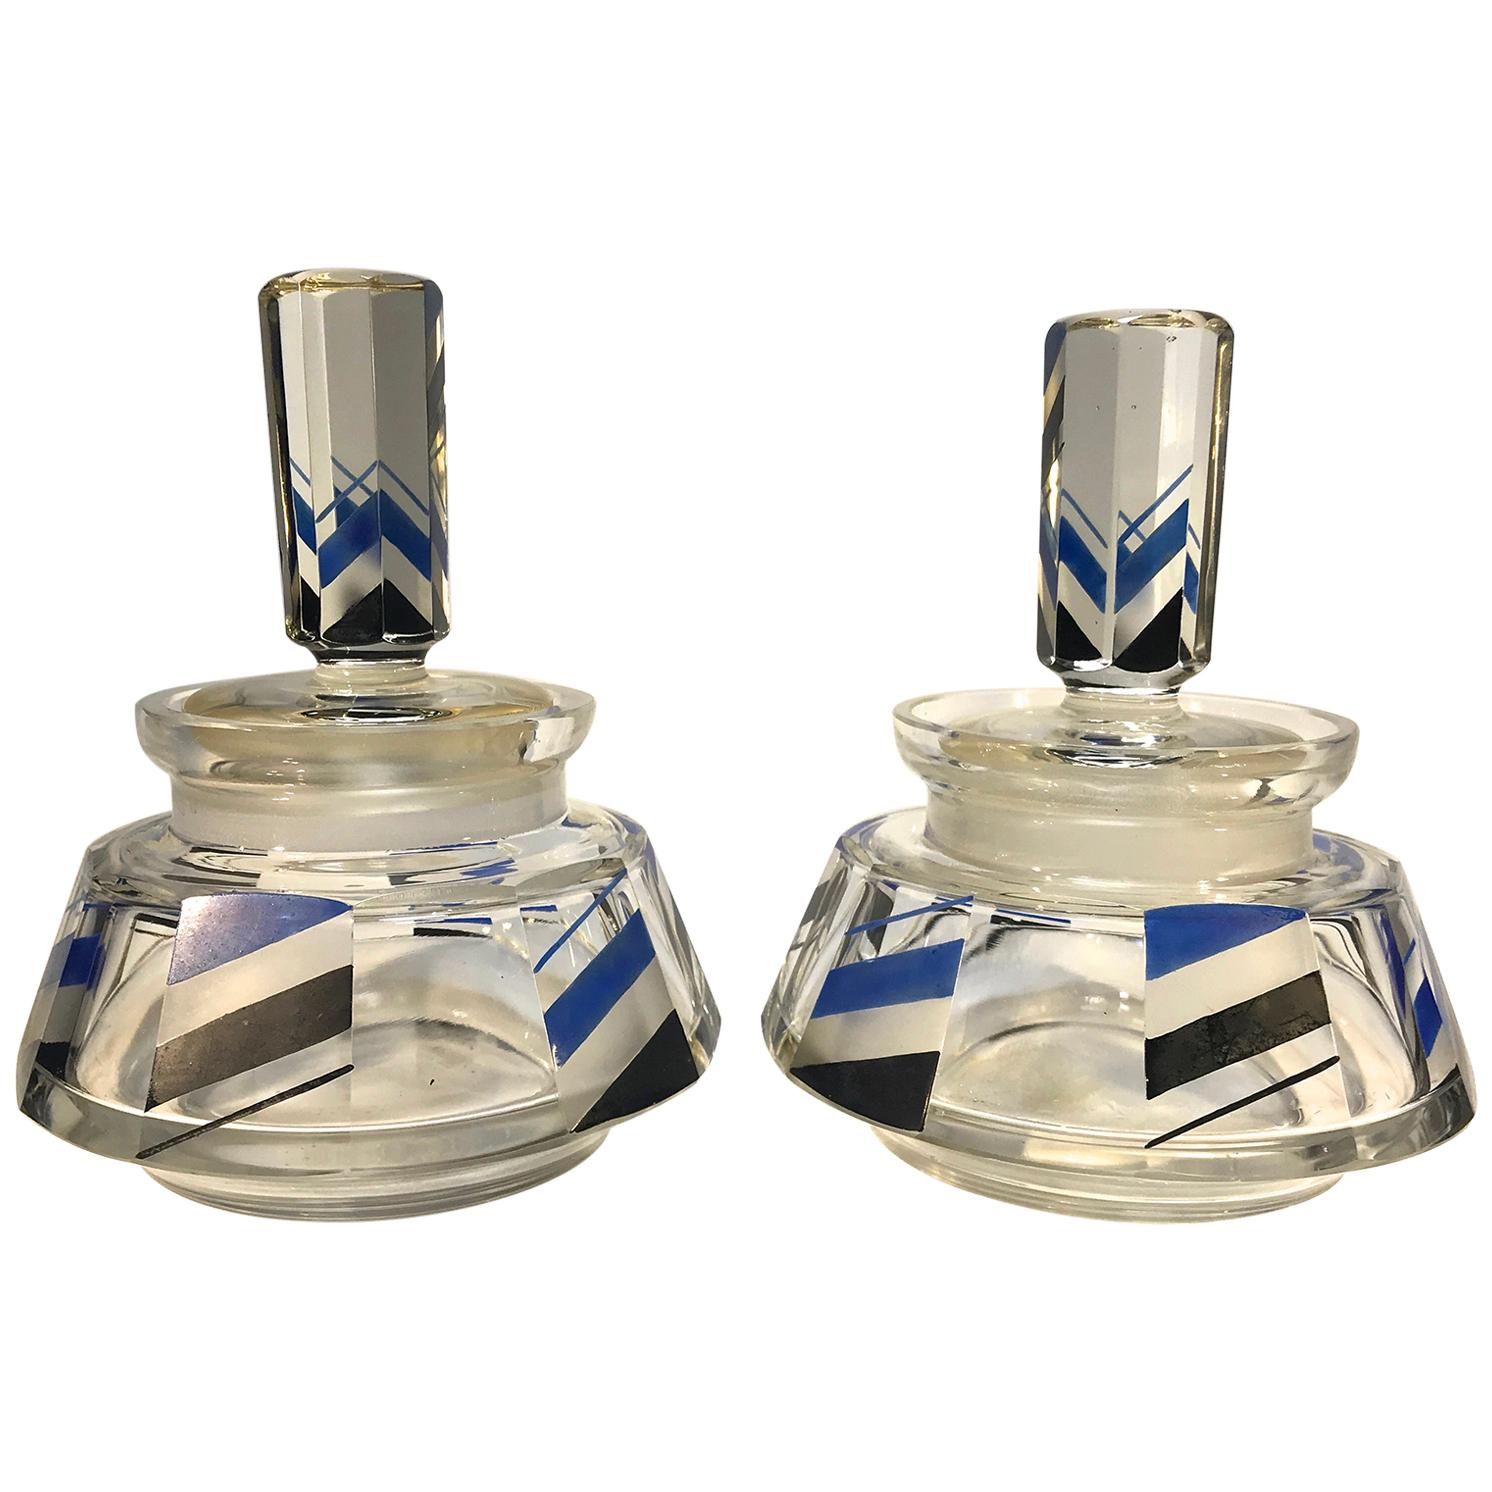 Pair of Art Deco Czech Black Silver Blue Enamel Lidded Vanity Pots, circa 1920s